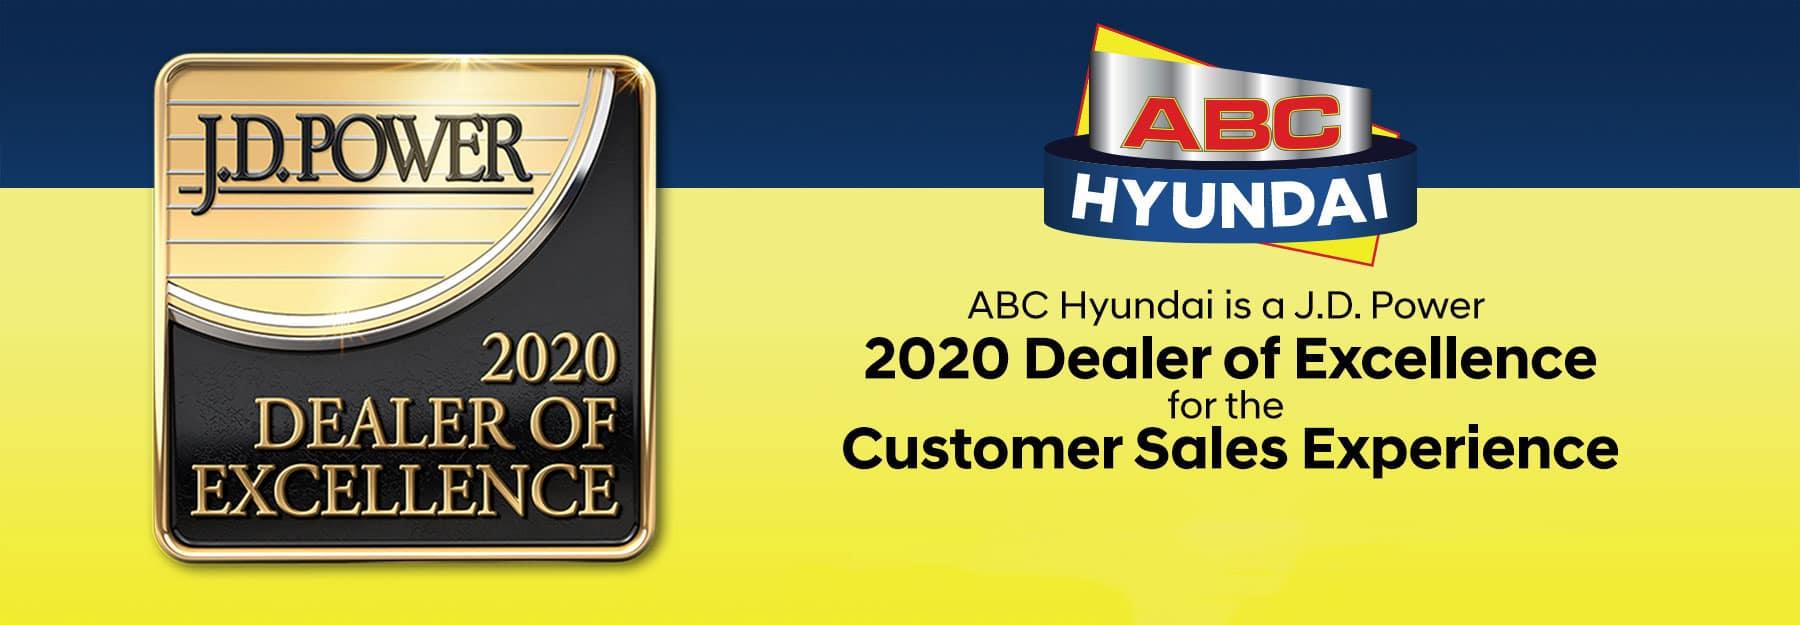 JD Power Program: 2020 Dealer of Excellence